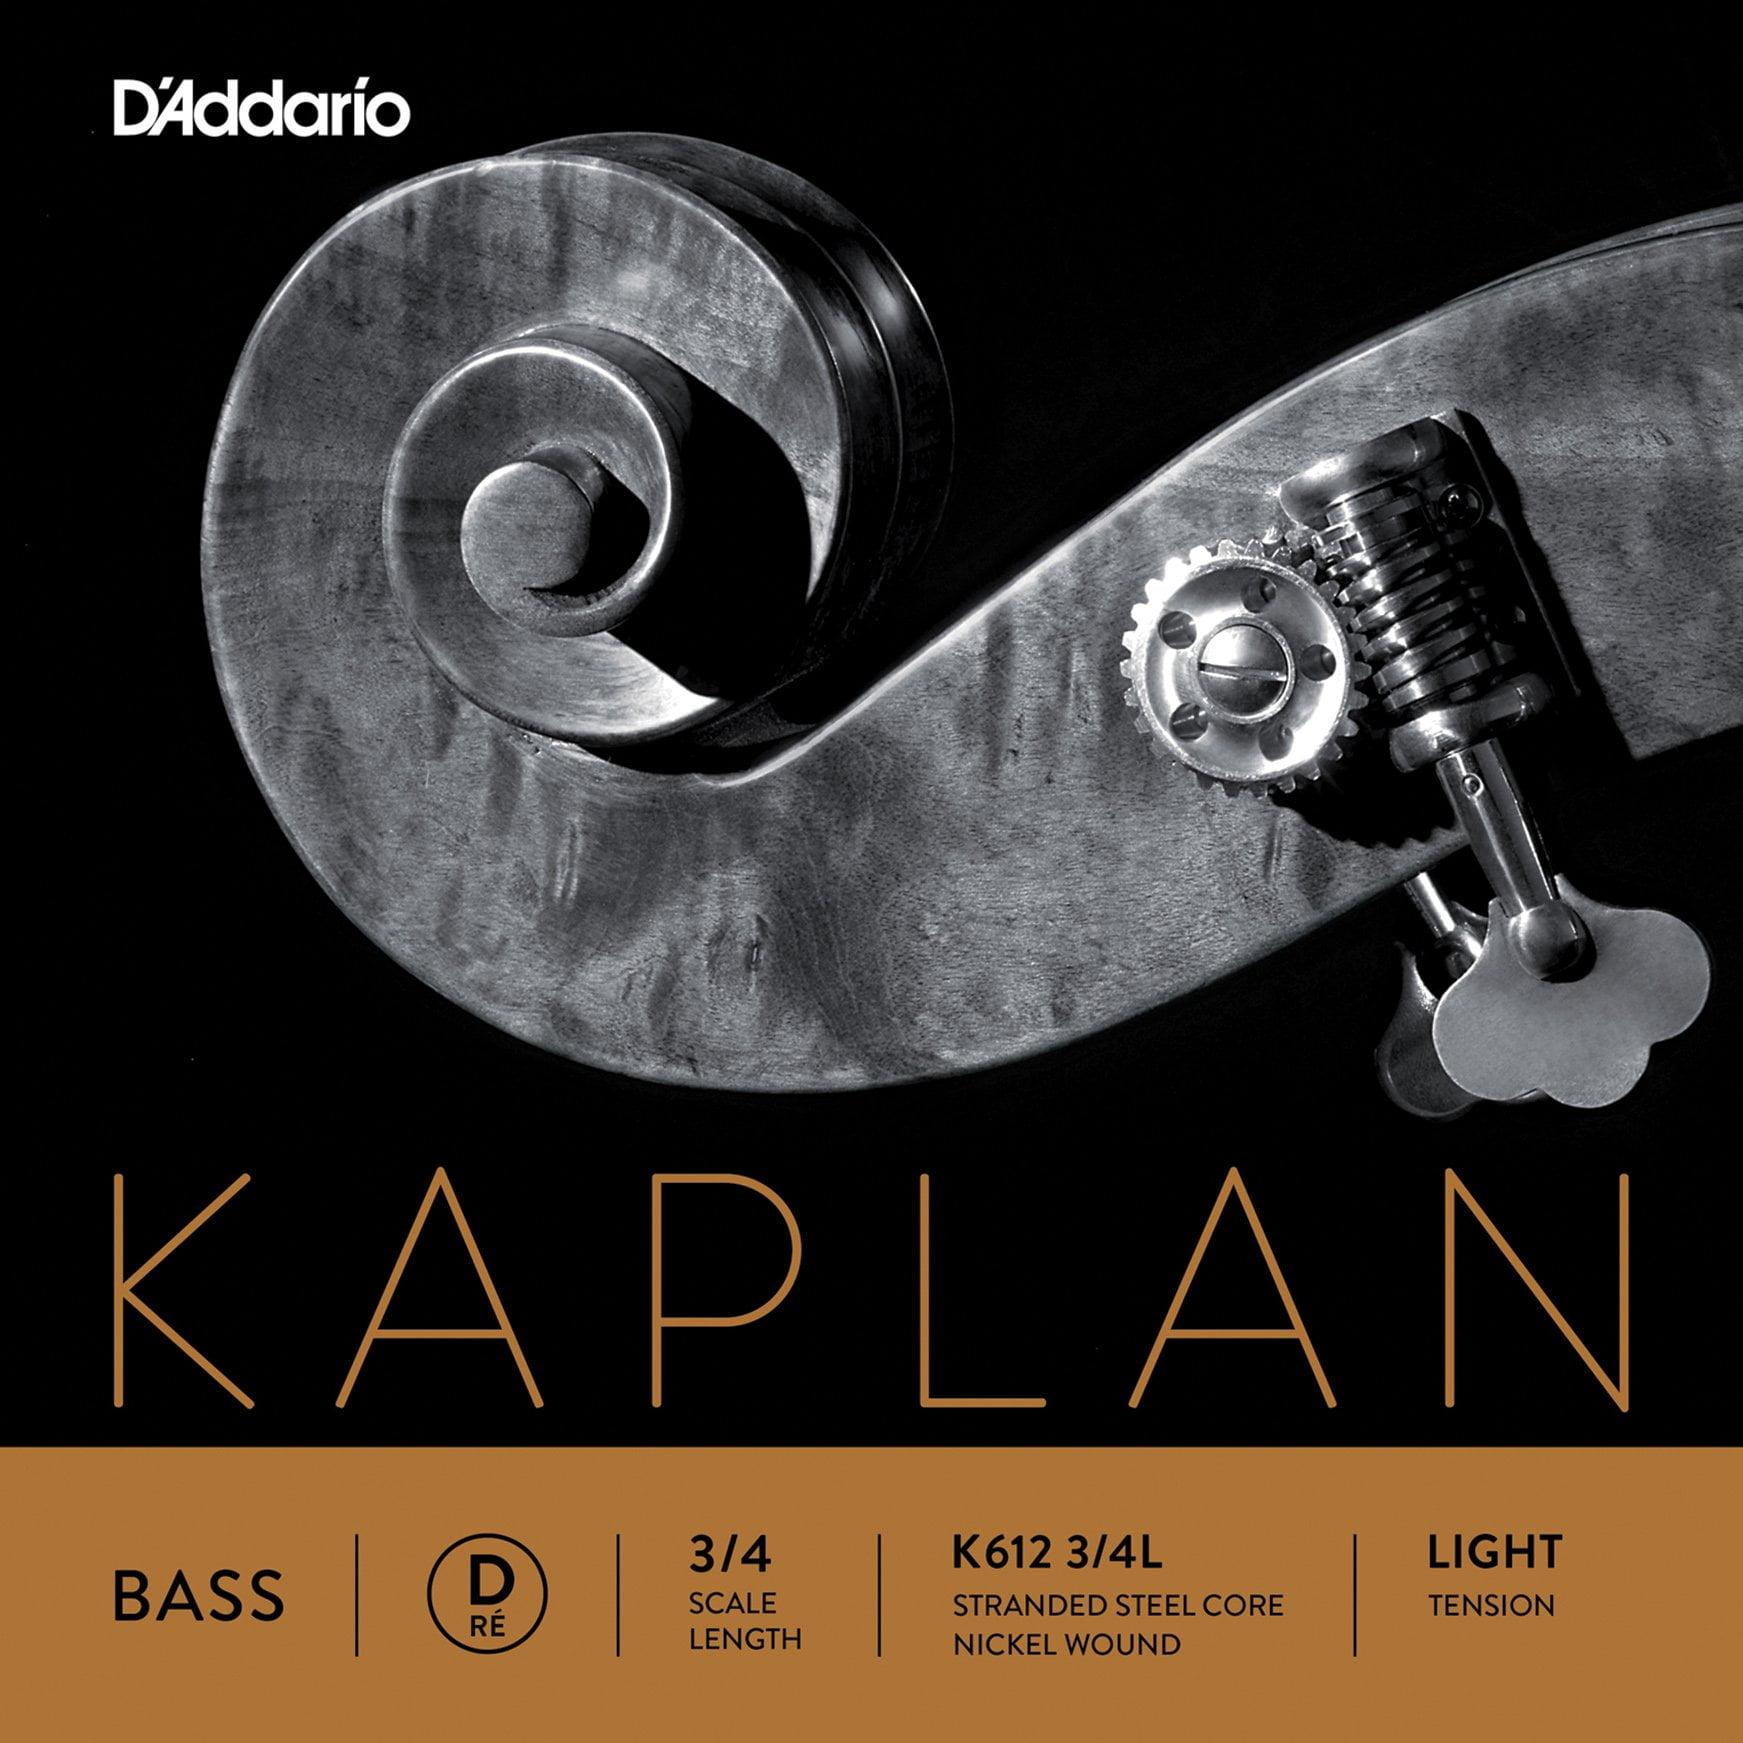 Kaplan Double Bass D String 3/4 Low